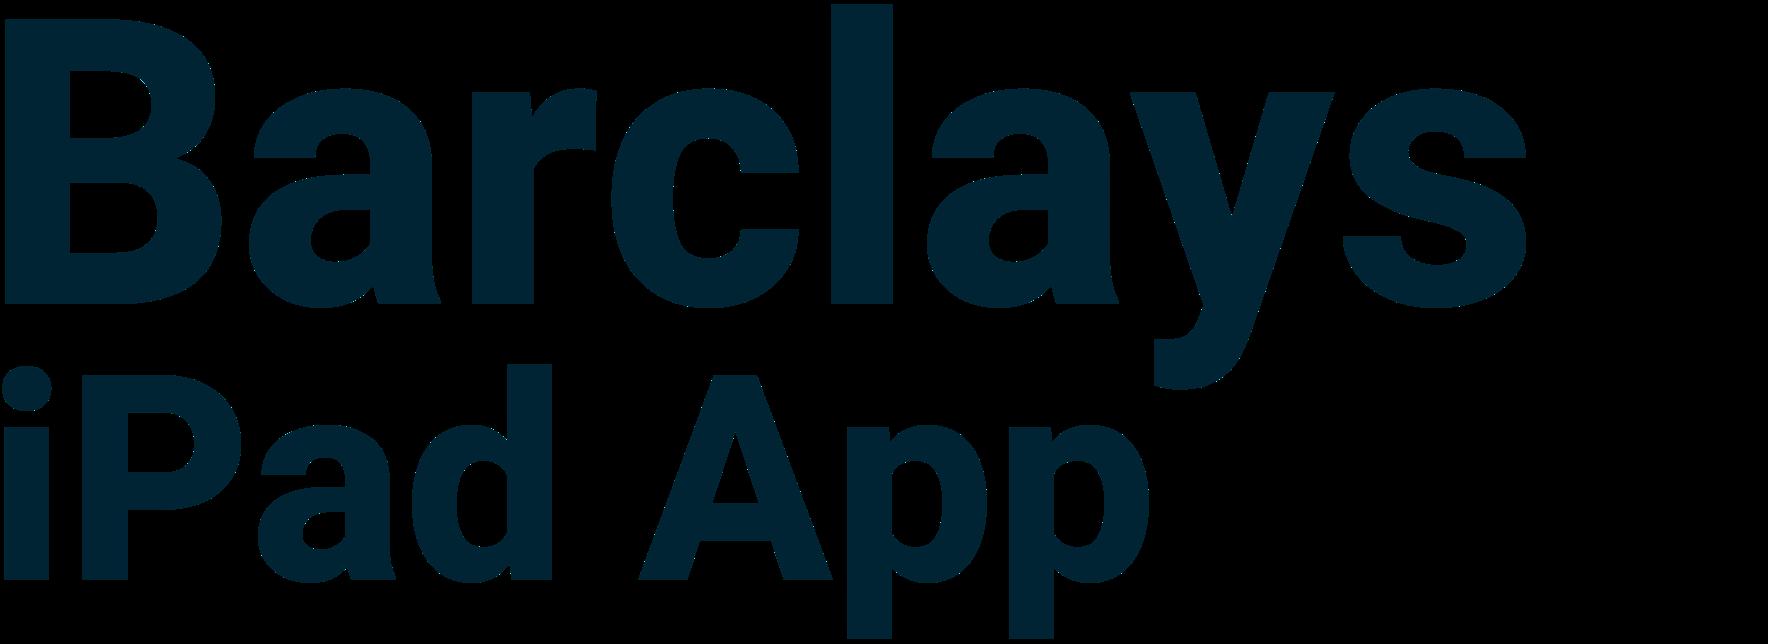 Barclays iPad App